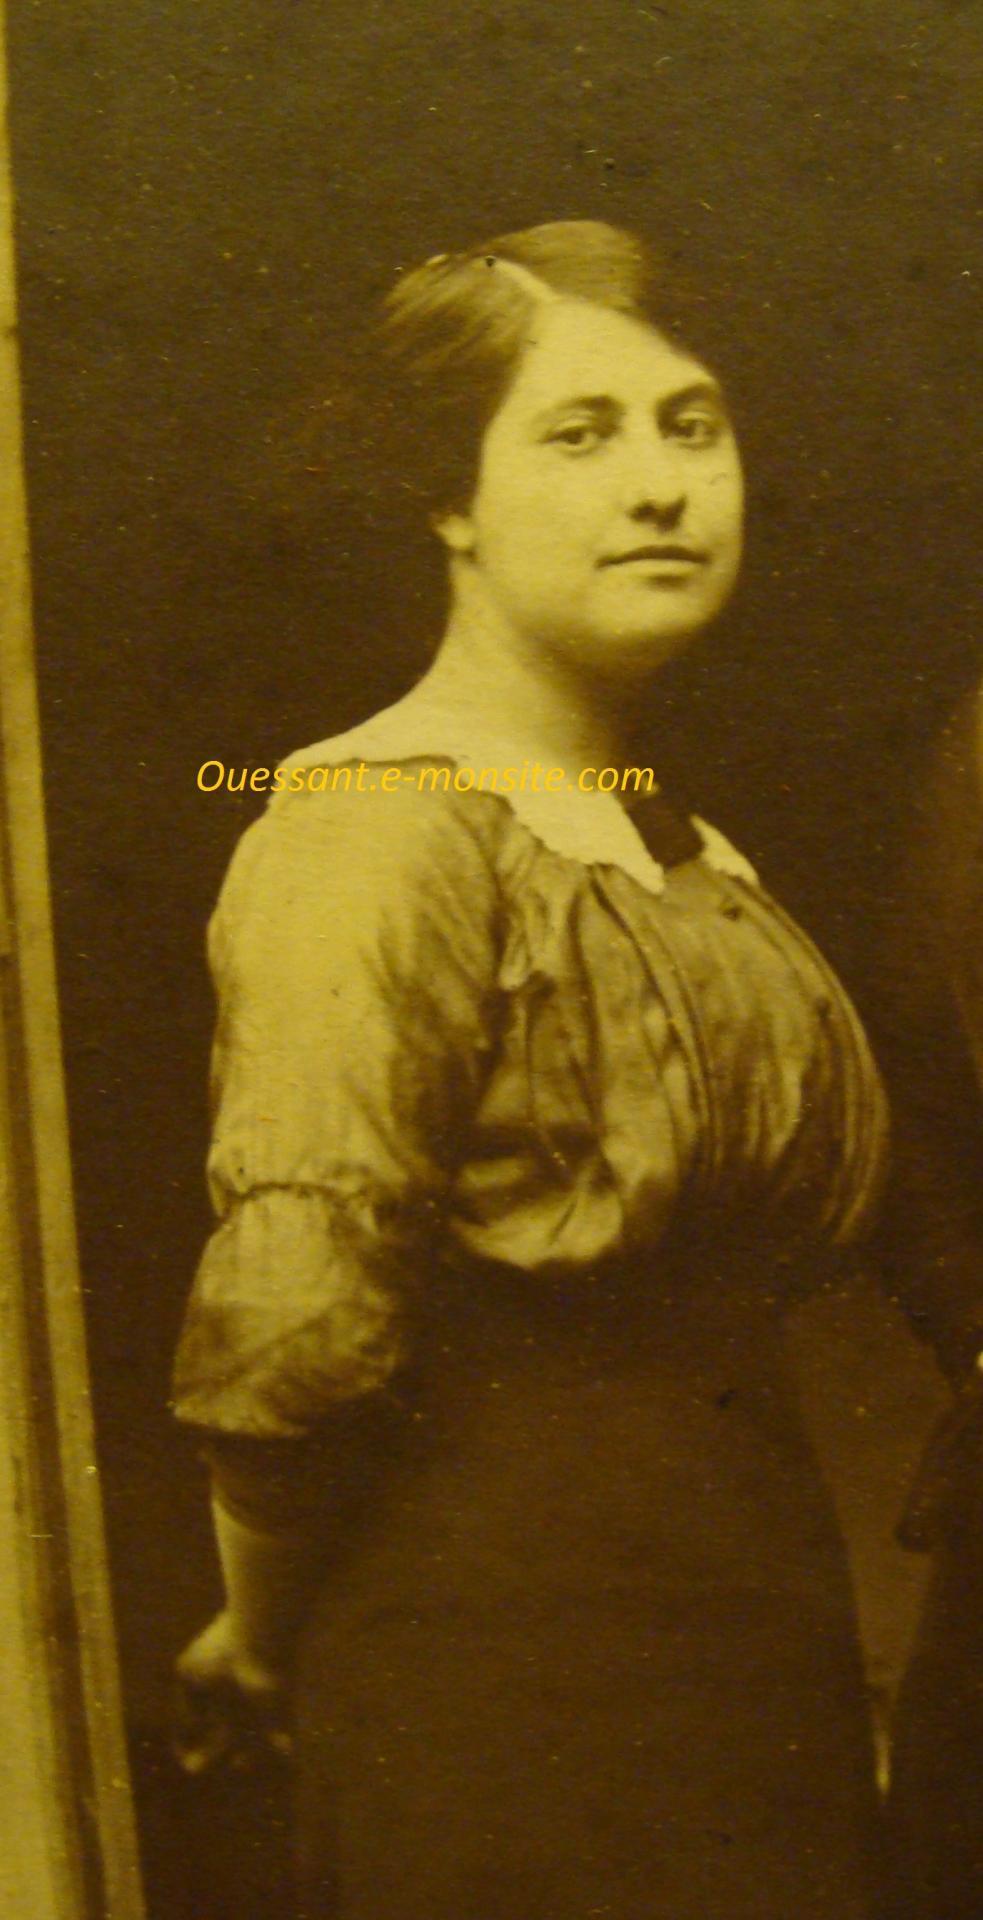 Antoinette Mennecier